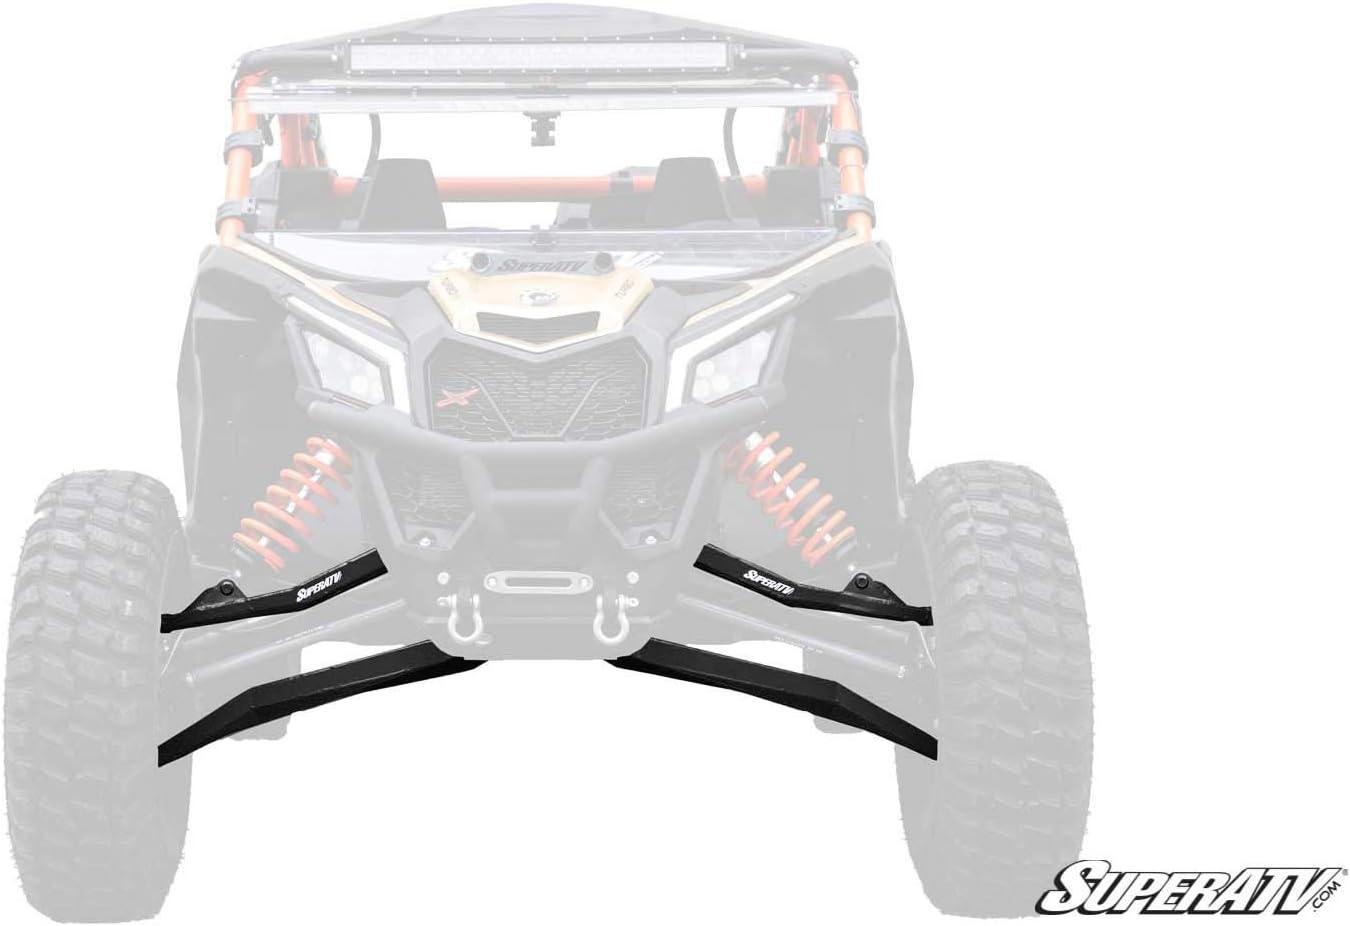 SuperATV Heavy Duty Rhino 2.0 Can-Am Maverick X3 X RS Turbo R Axle Front Left 2017+